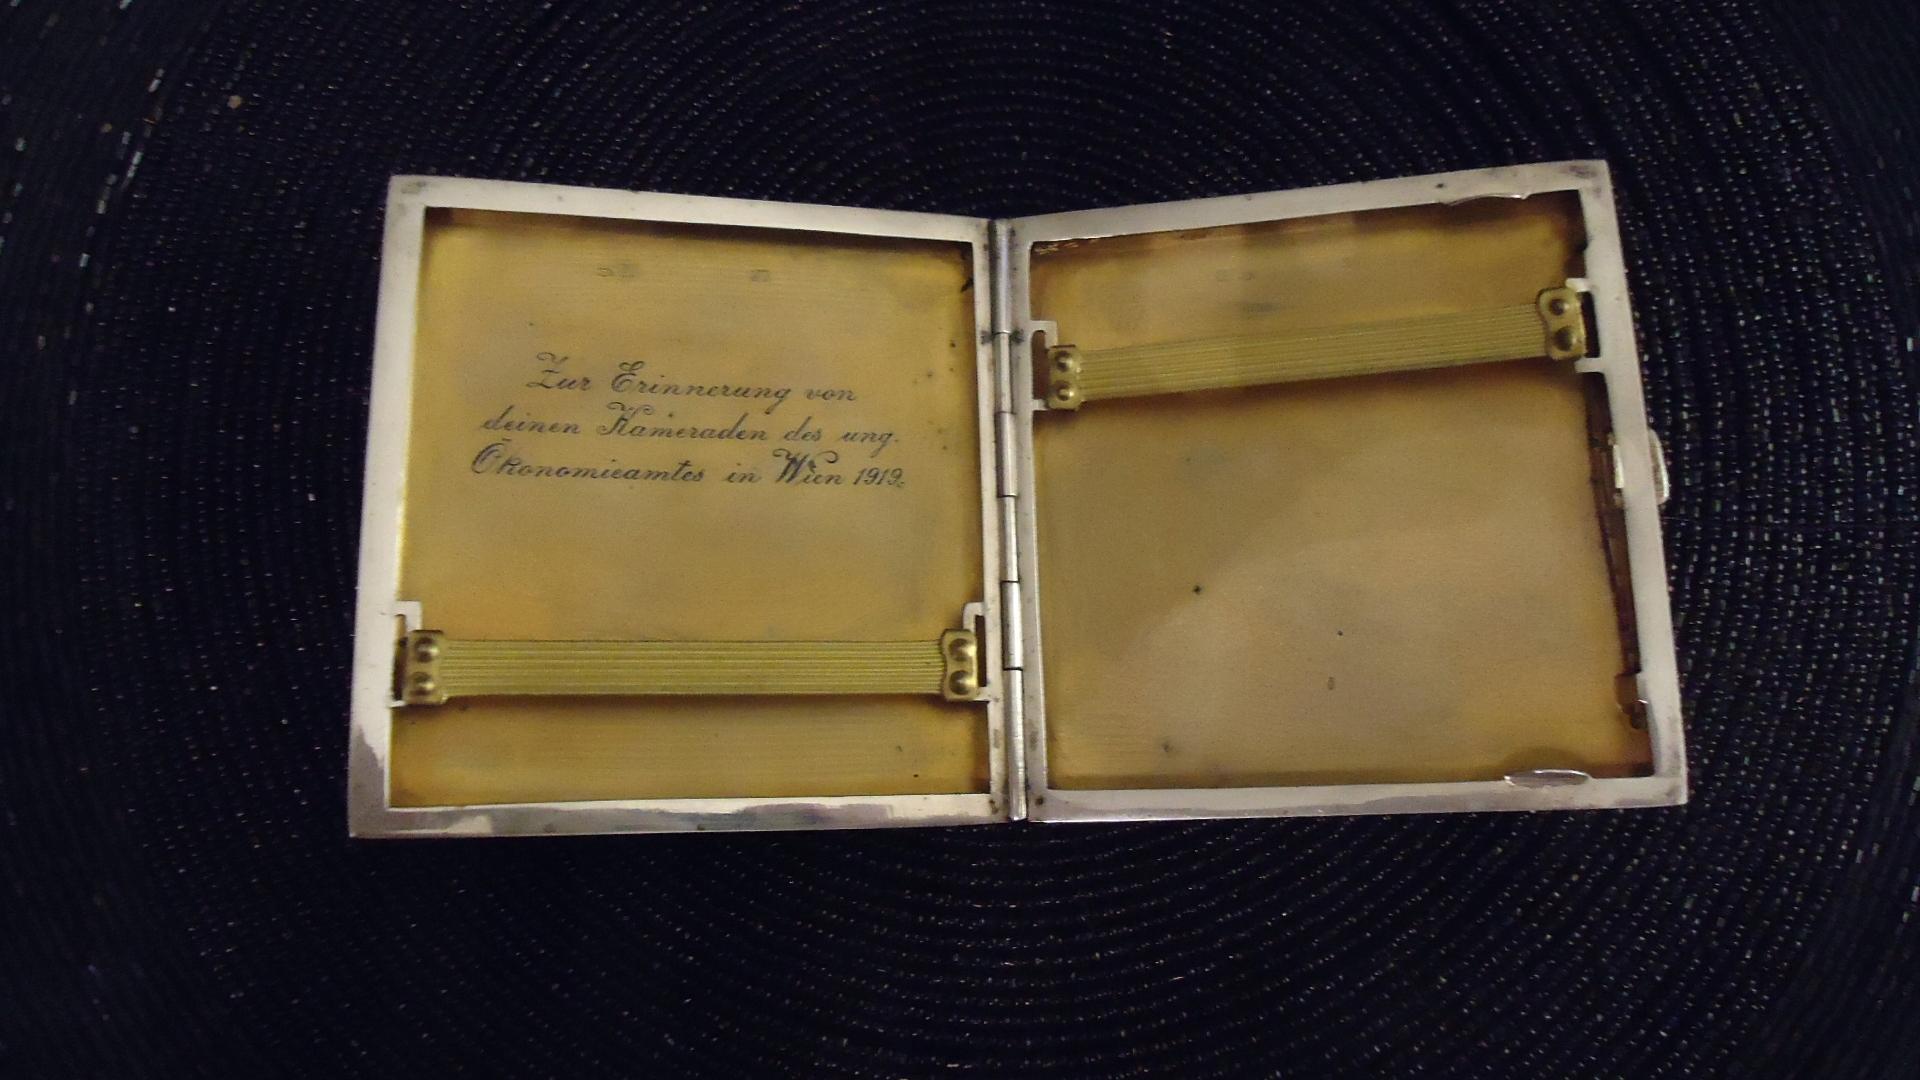 srebrna 100 letnia Wiedeńska papierośnica